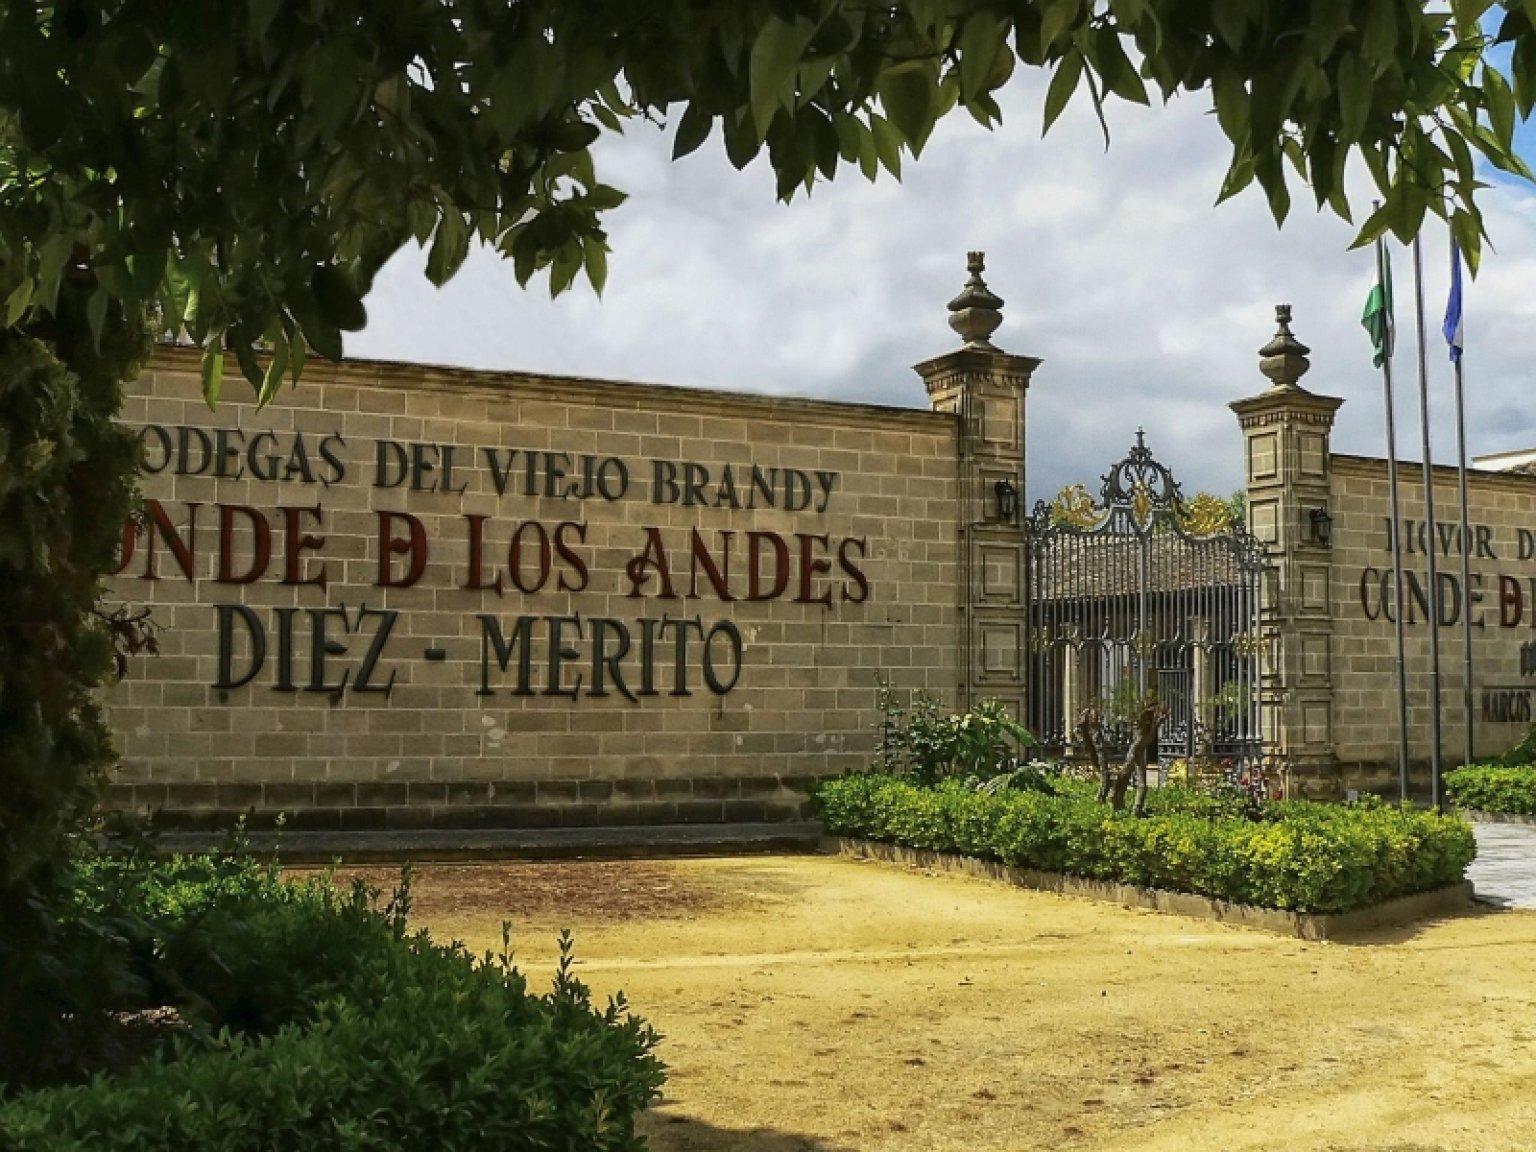 bodega-diez-merito-jardines